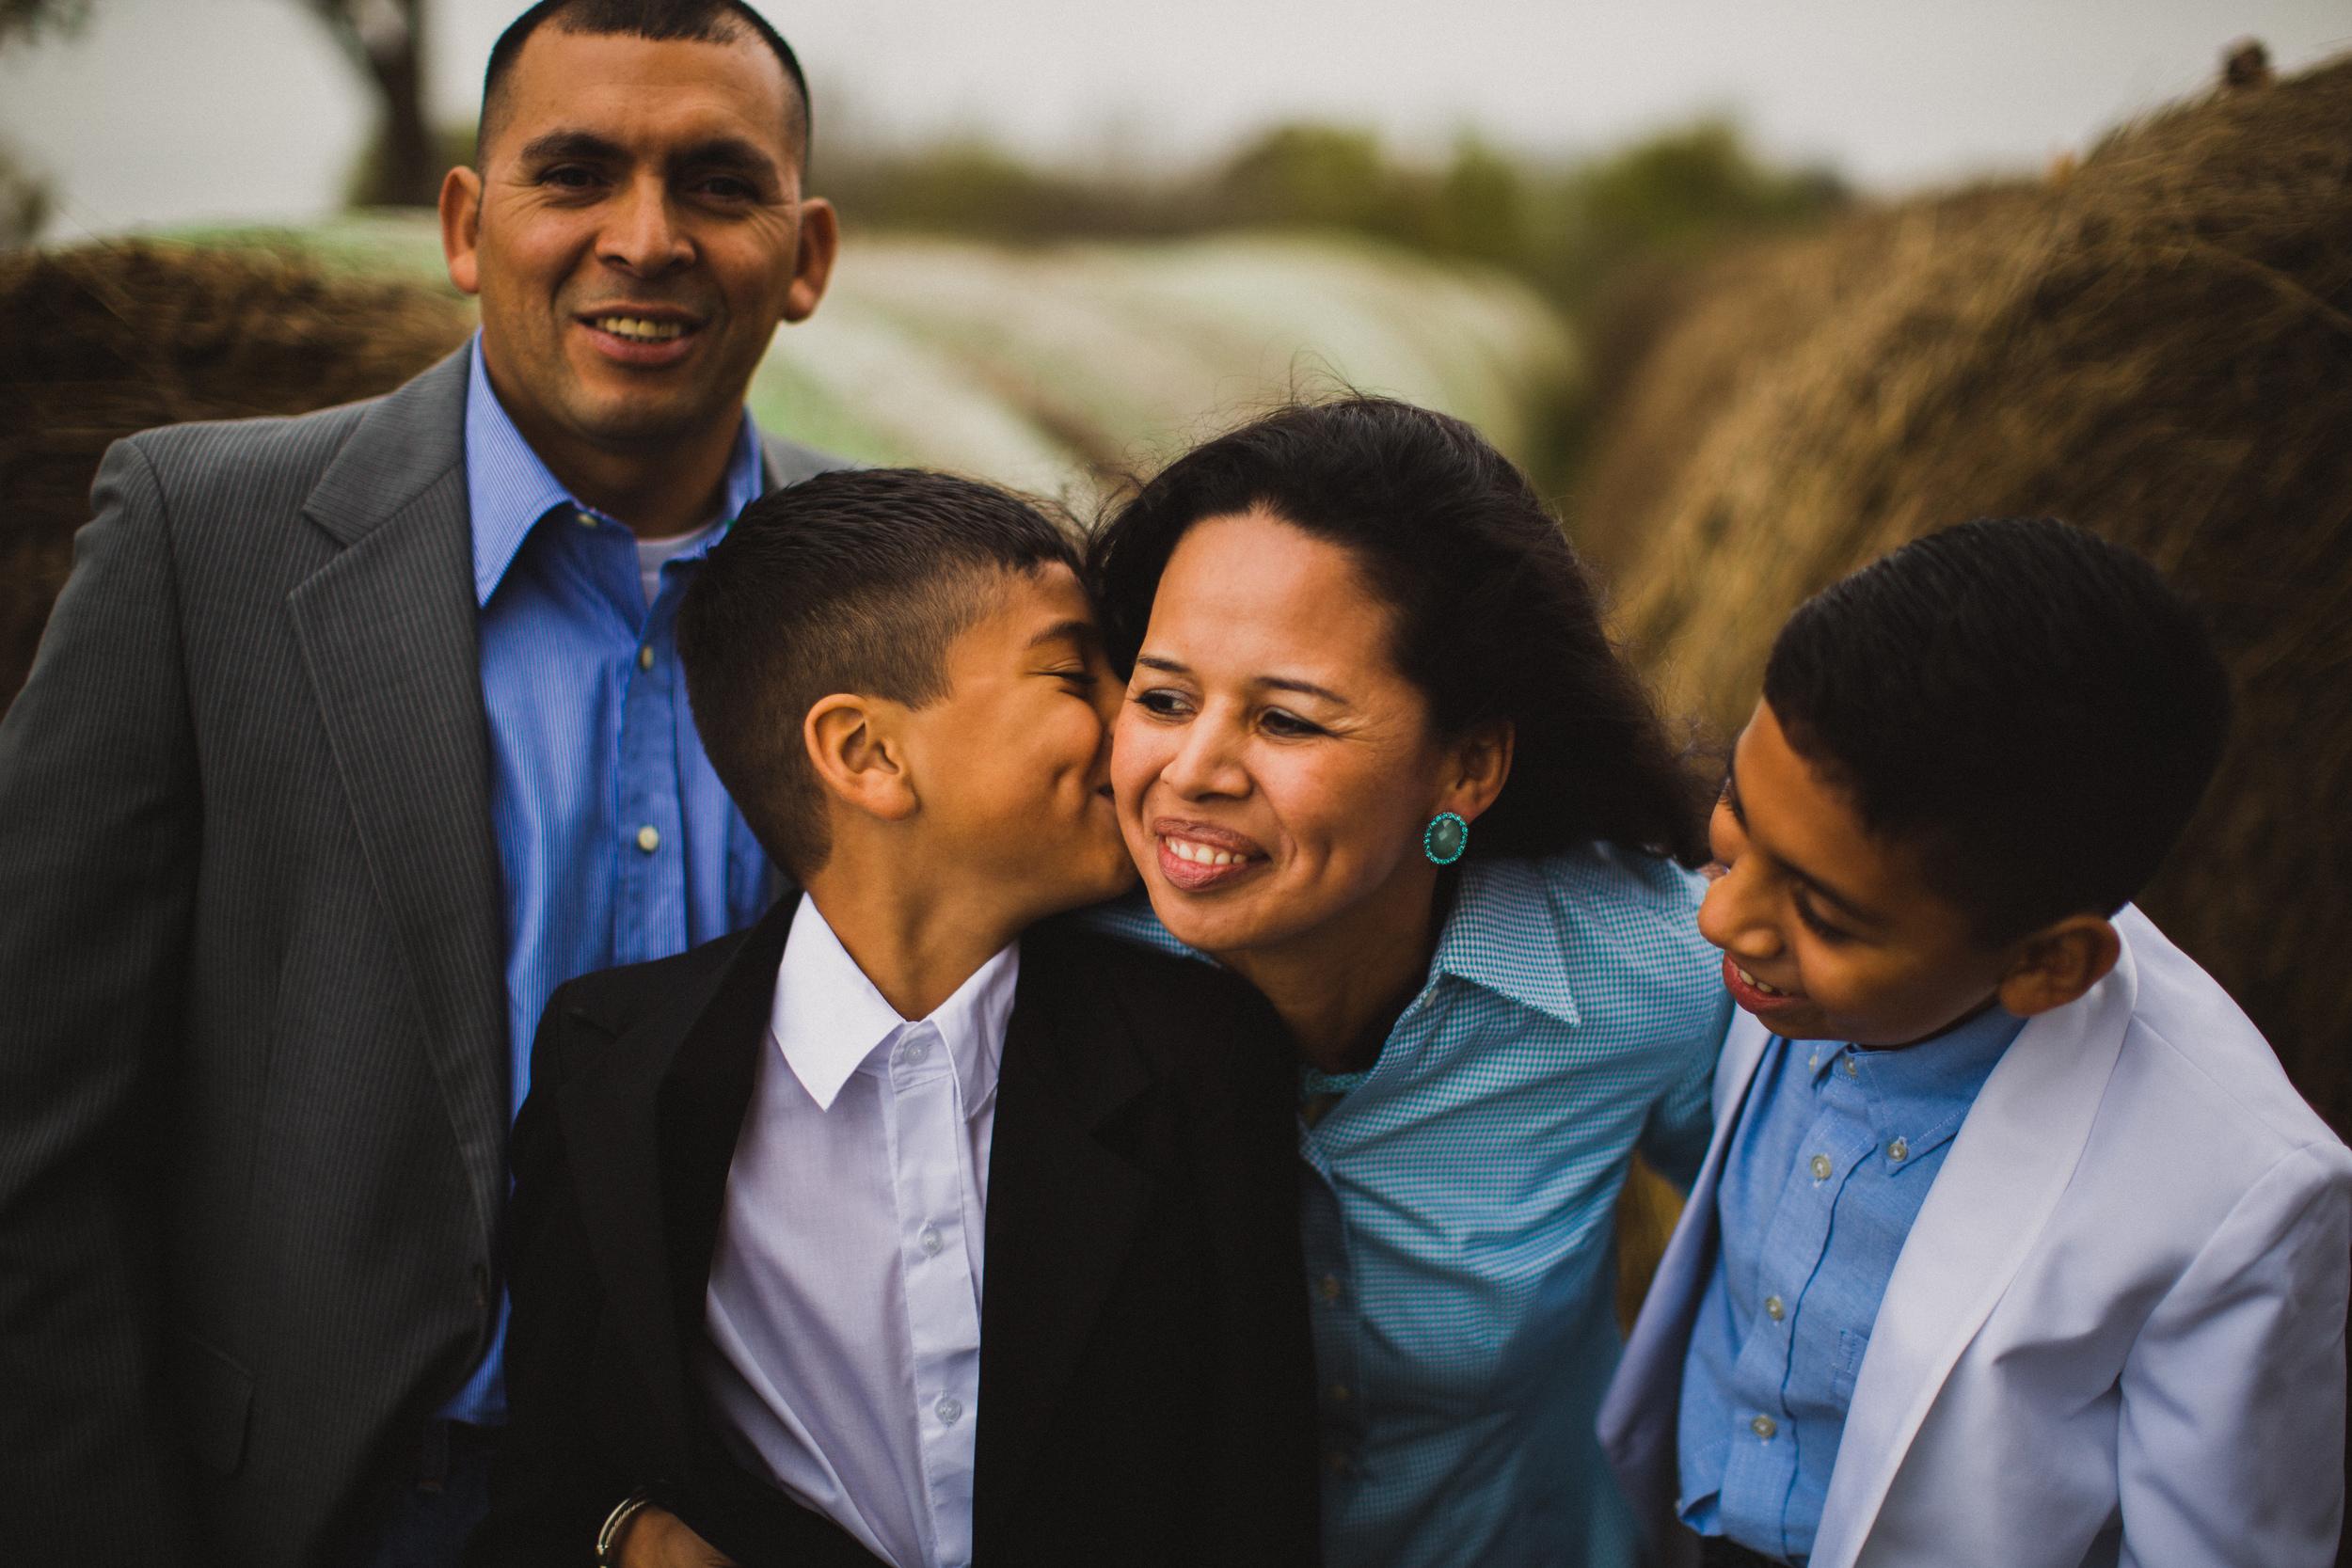 houston family photography_h2014_henriquez-53.jpg